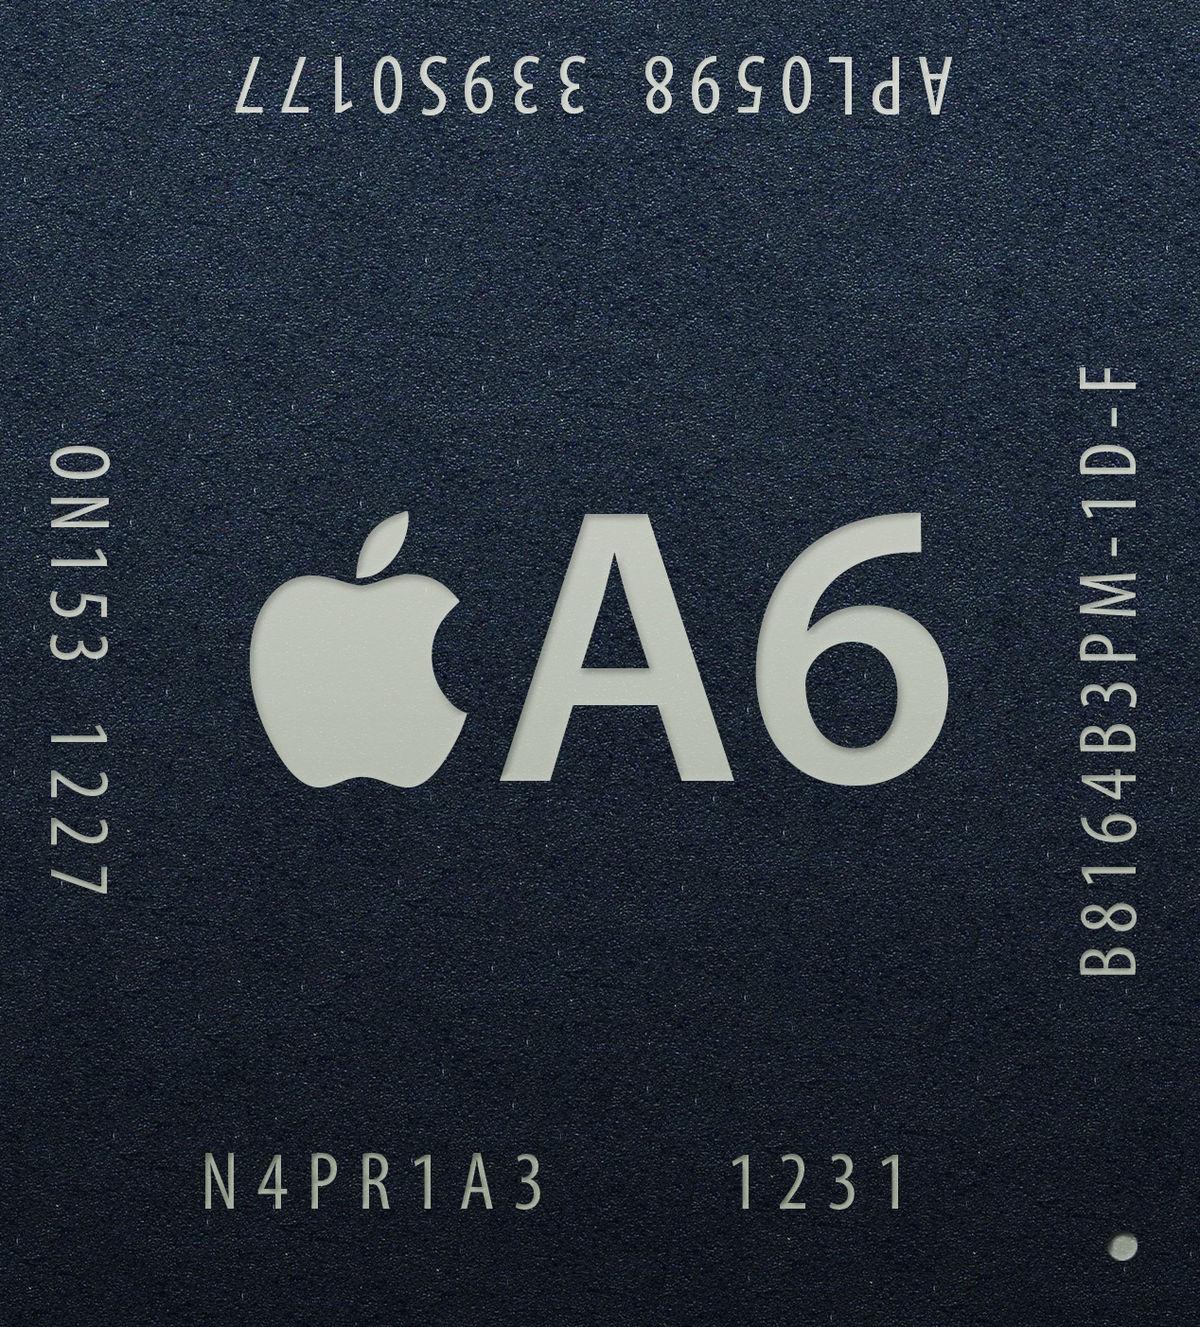 Apple A6 - Wikipedia